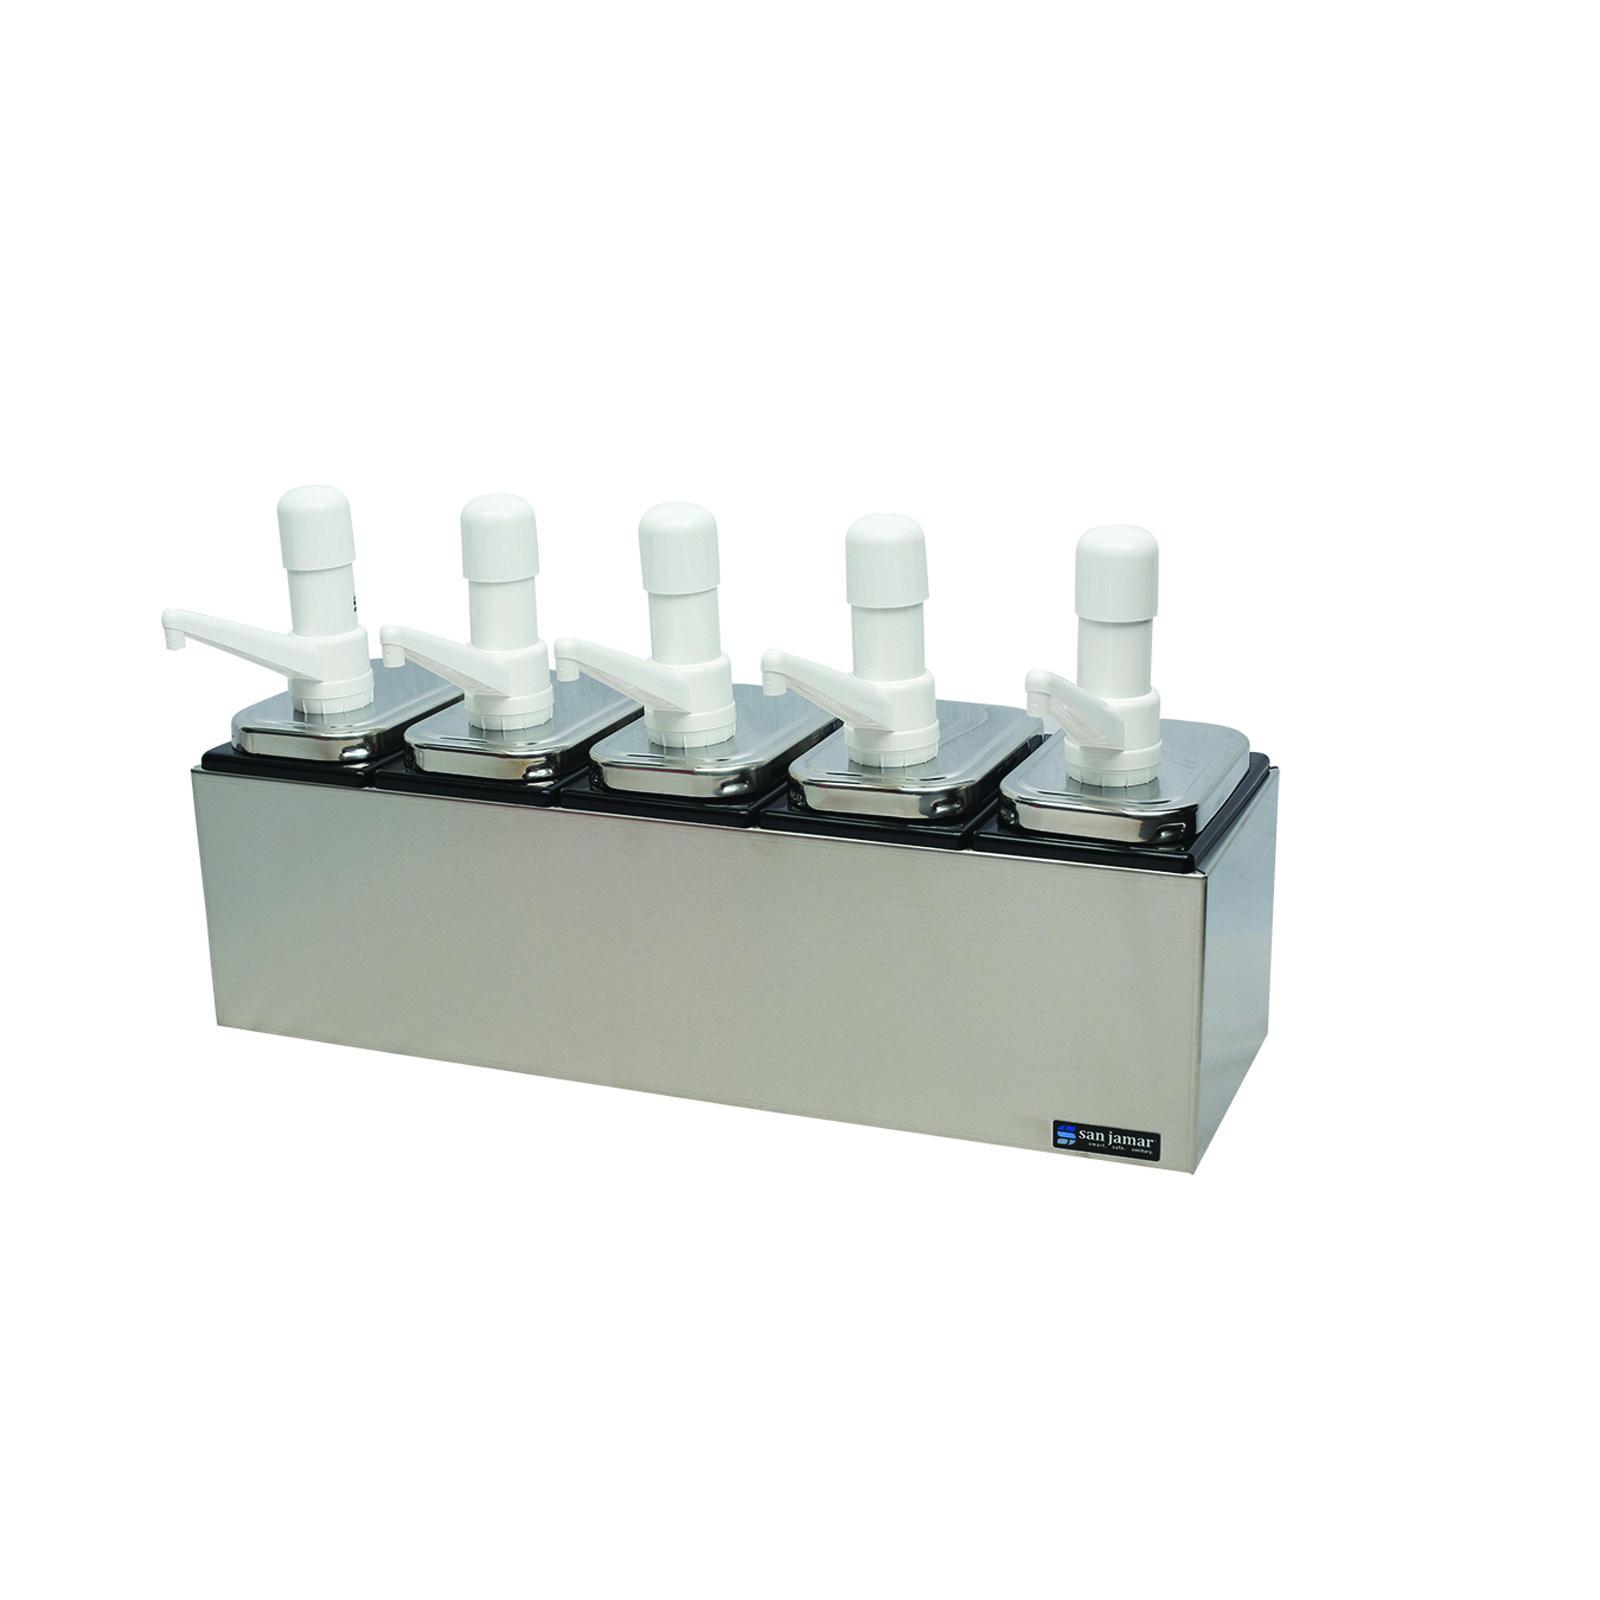 San Jamar P9715 condiment dispenser pump-style